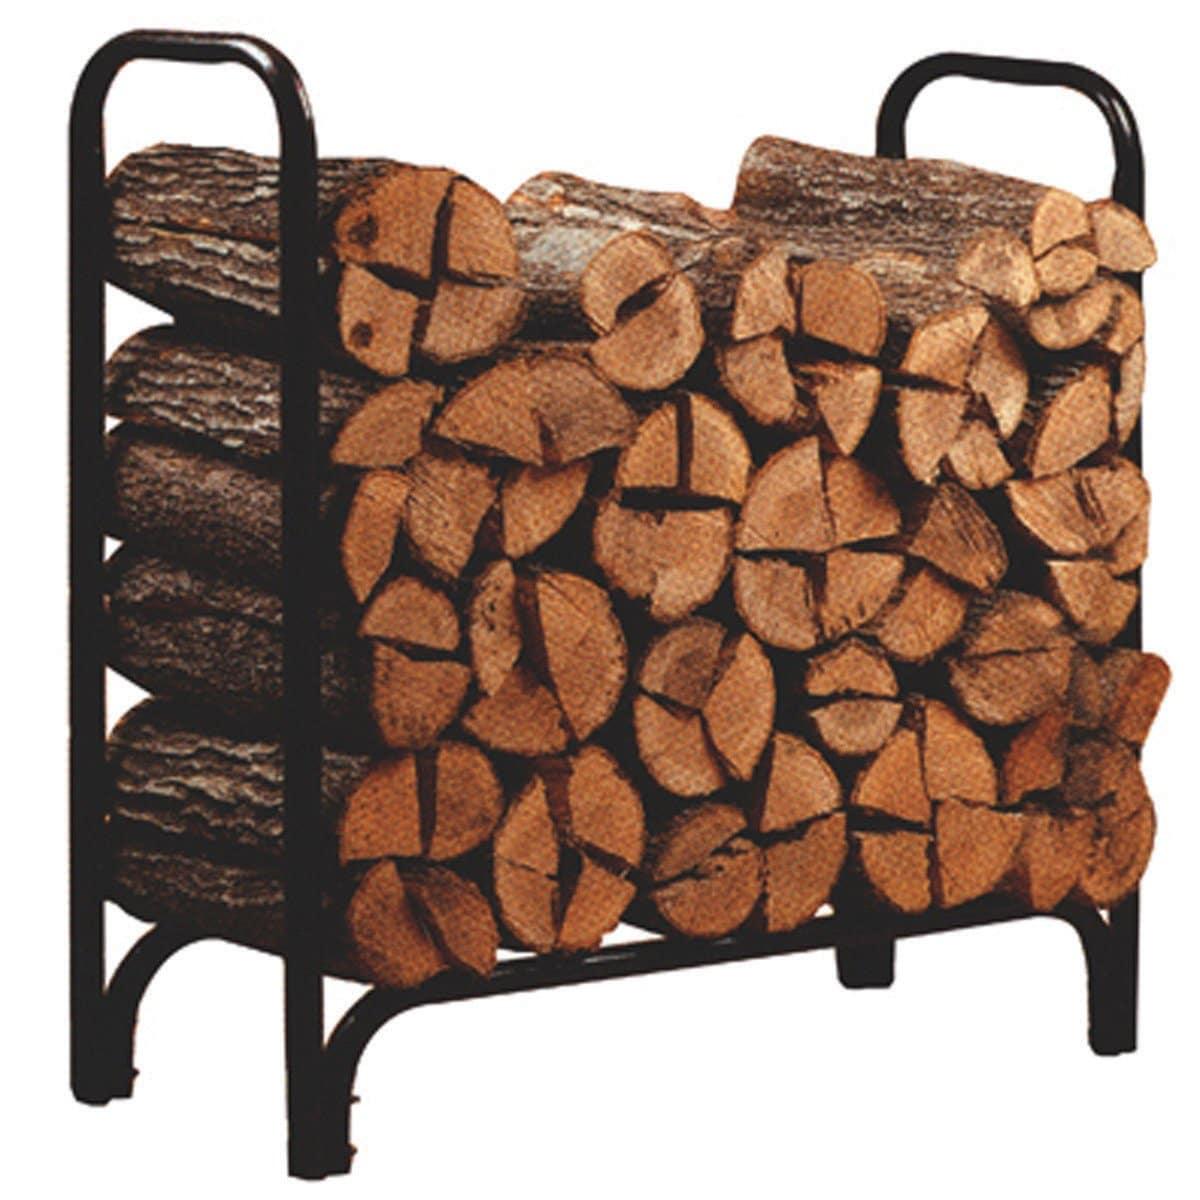 Panacea Outdoor Firewood Racks